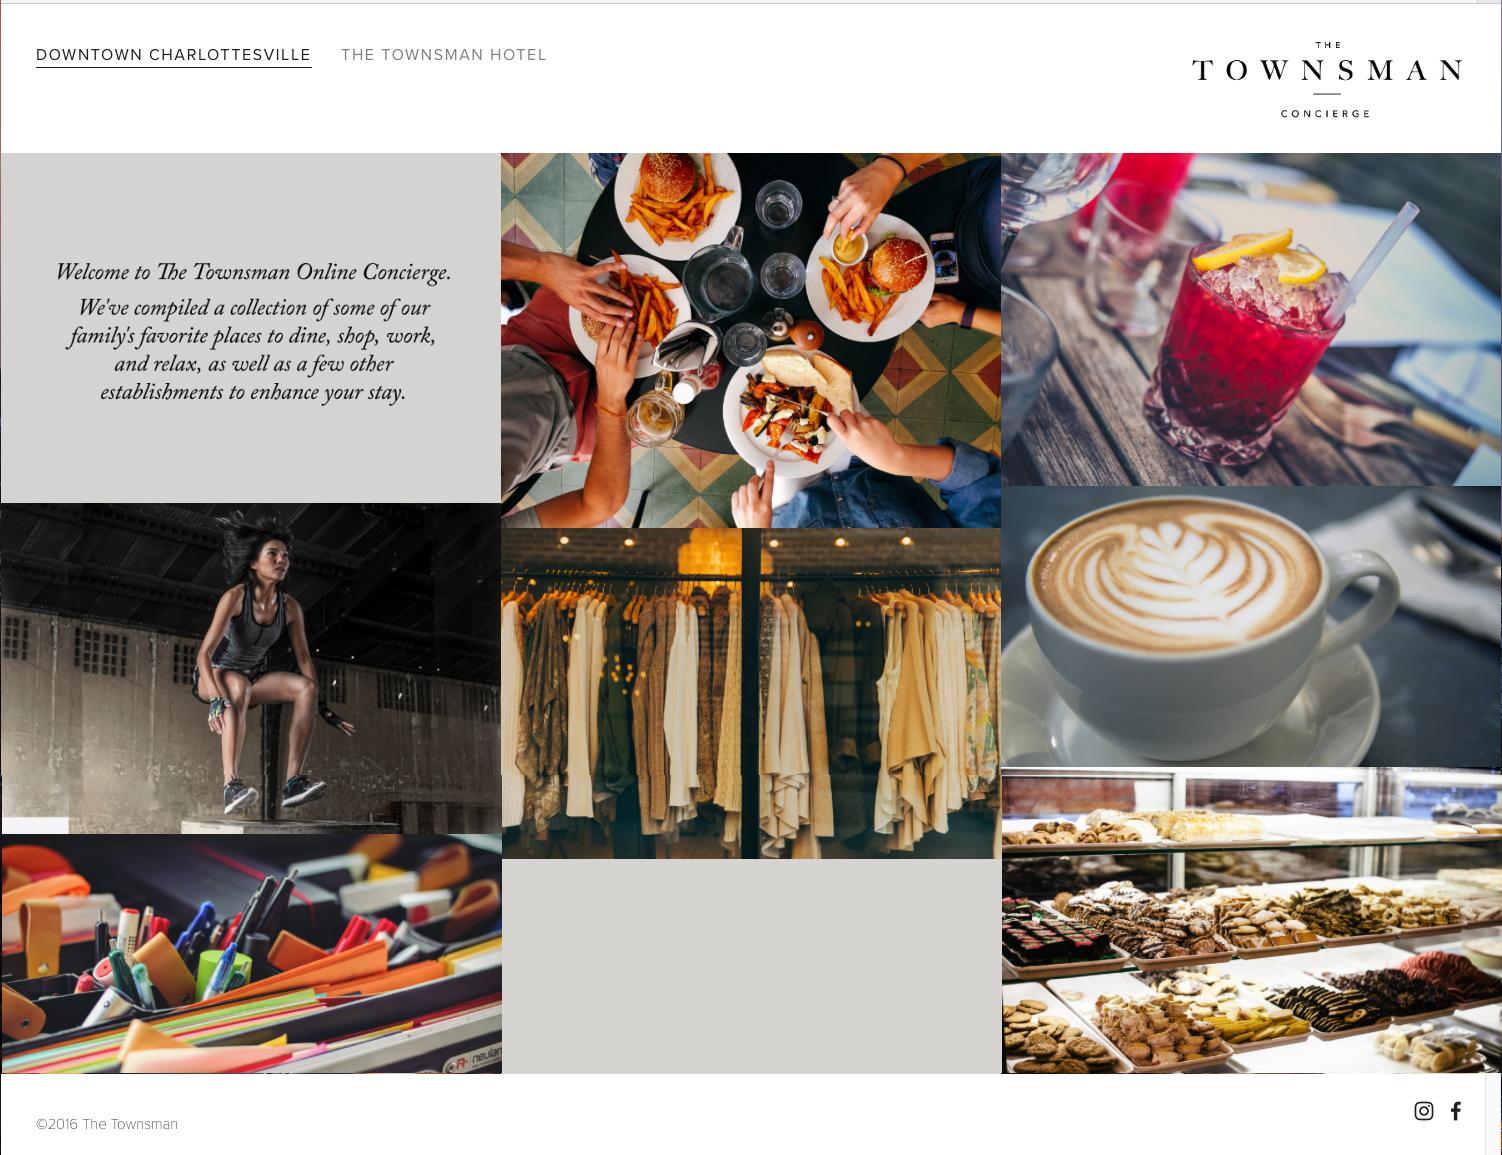 The Townsman Concierge website designed by Hive.